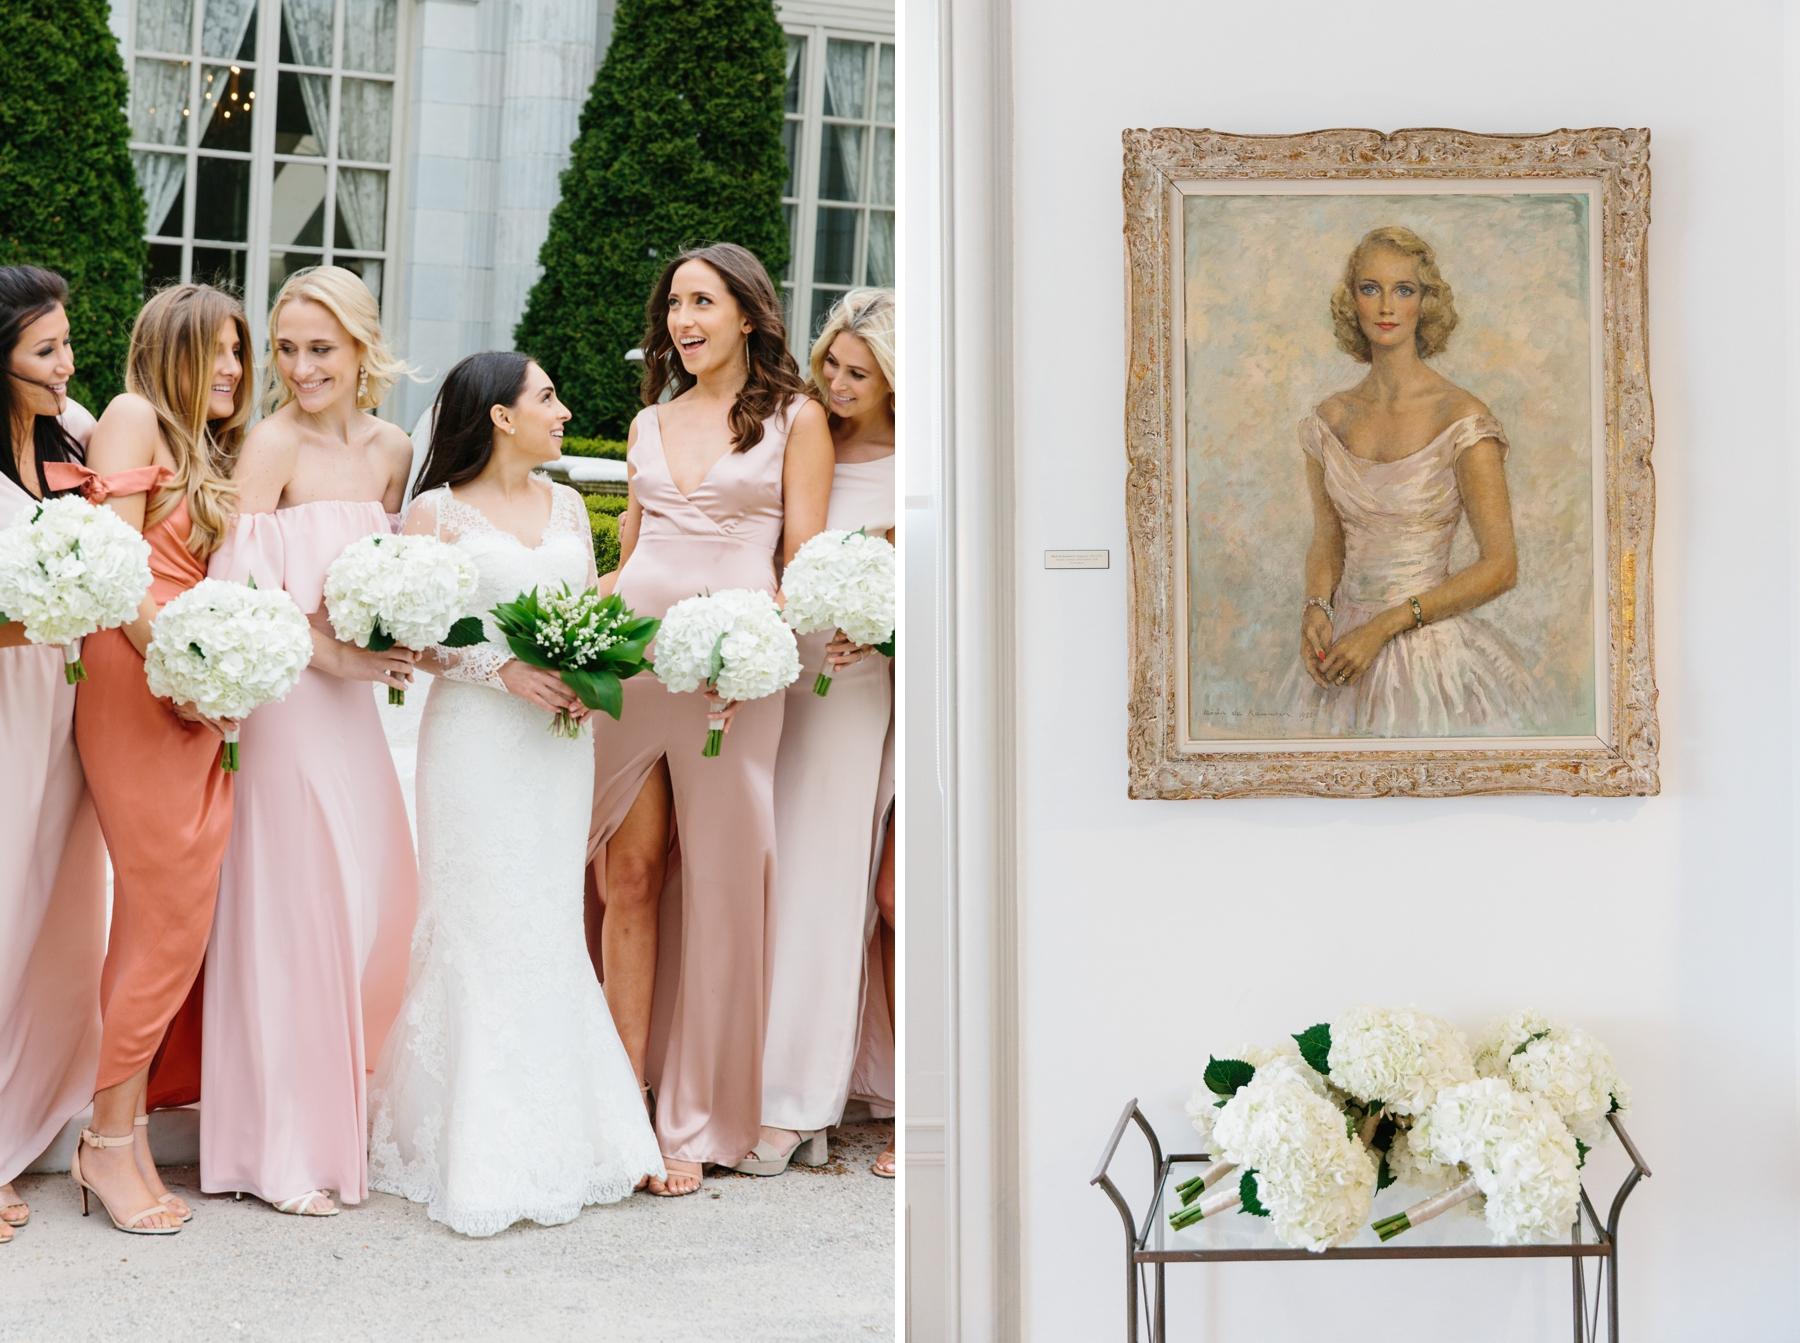 rosecliff bridesmaids